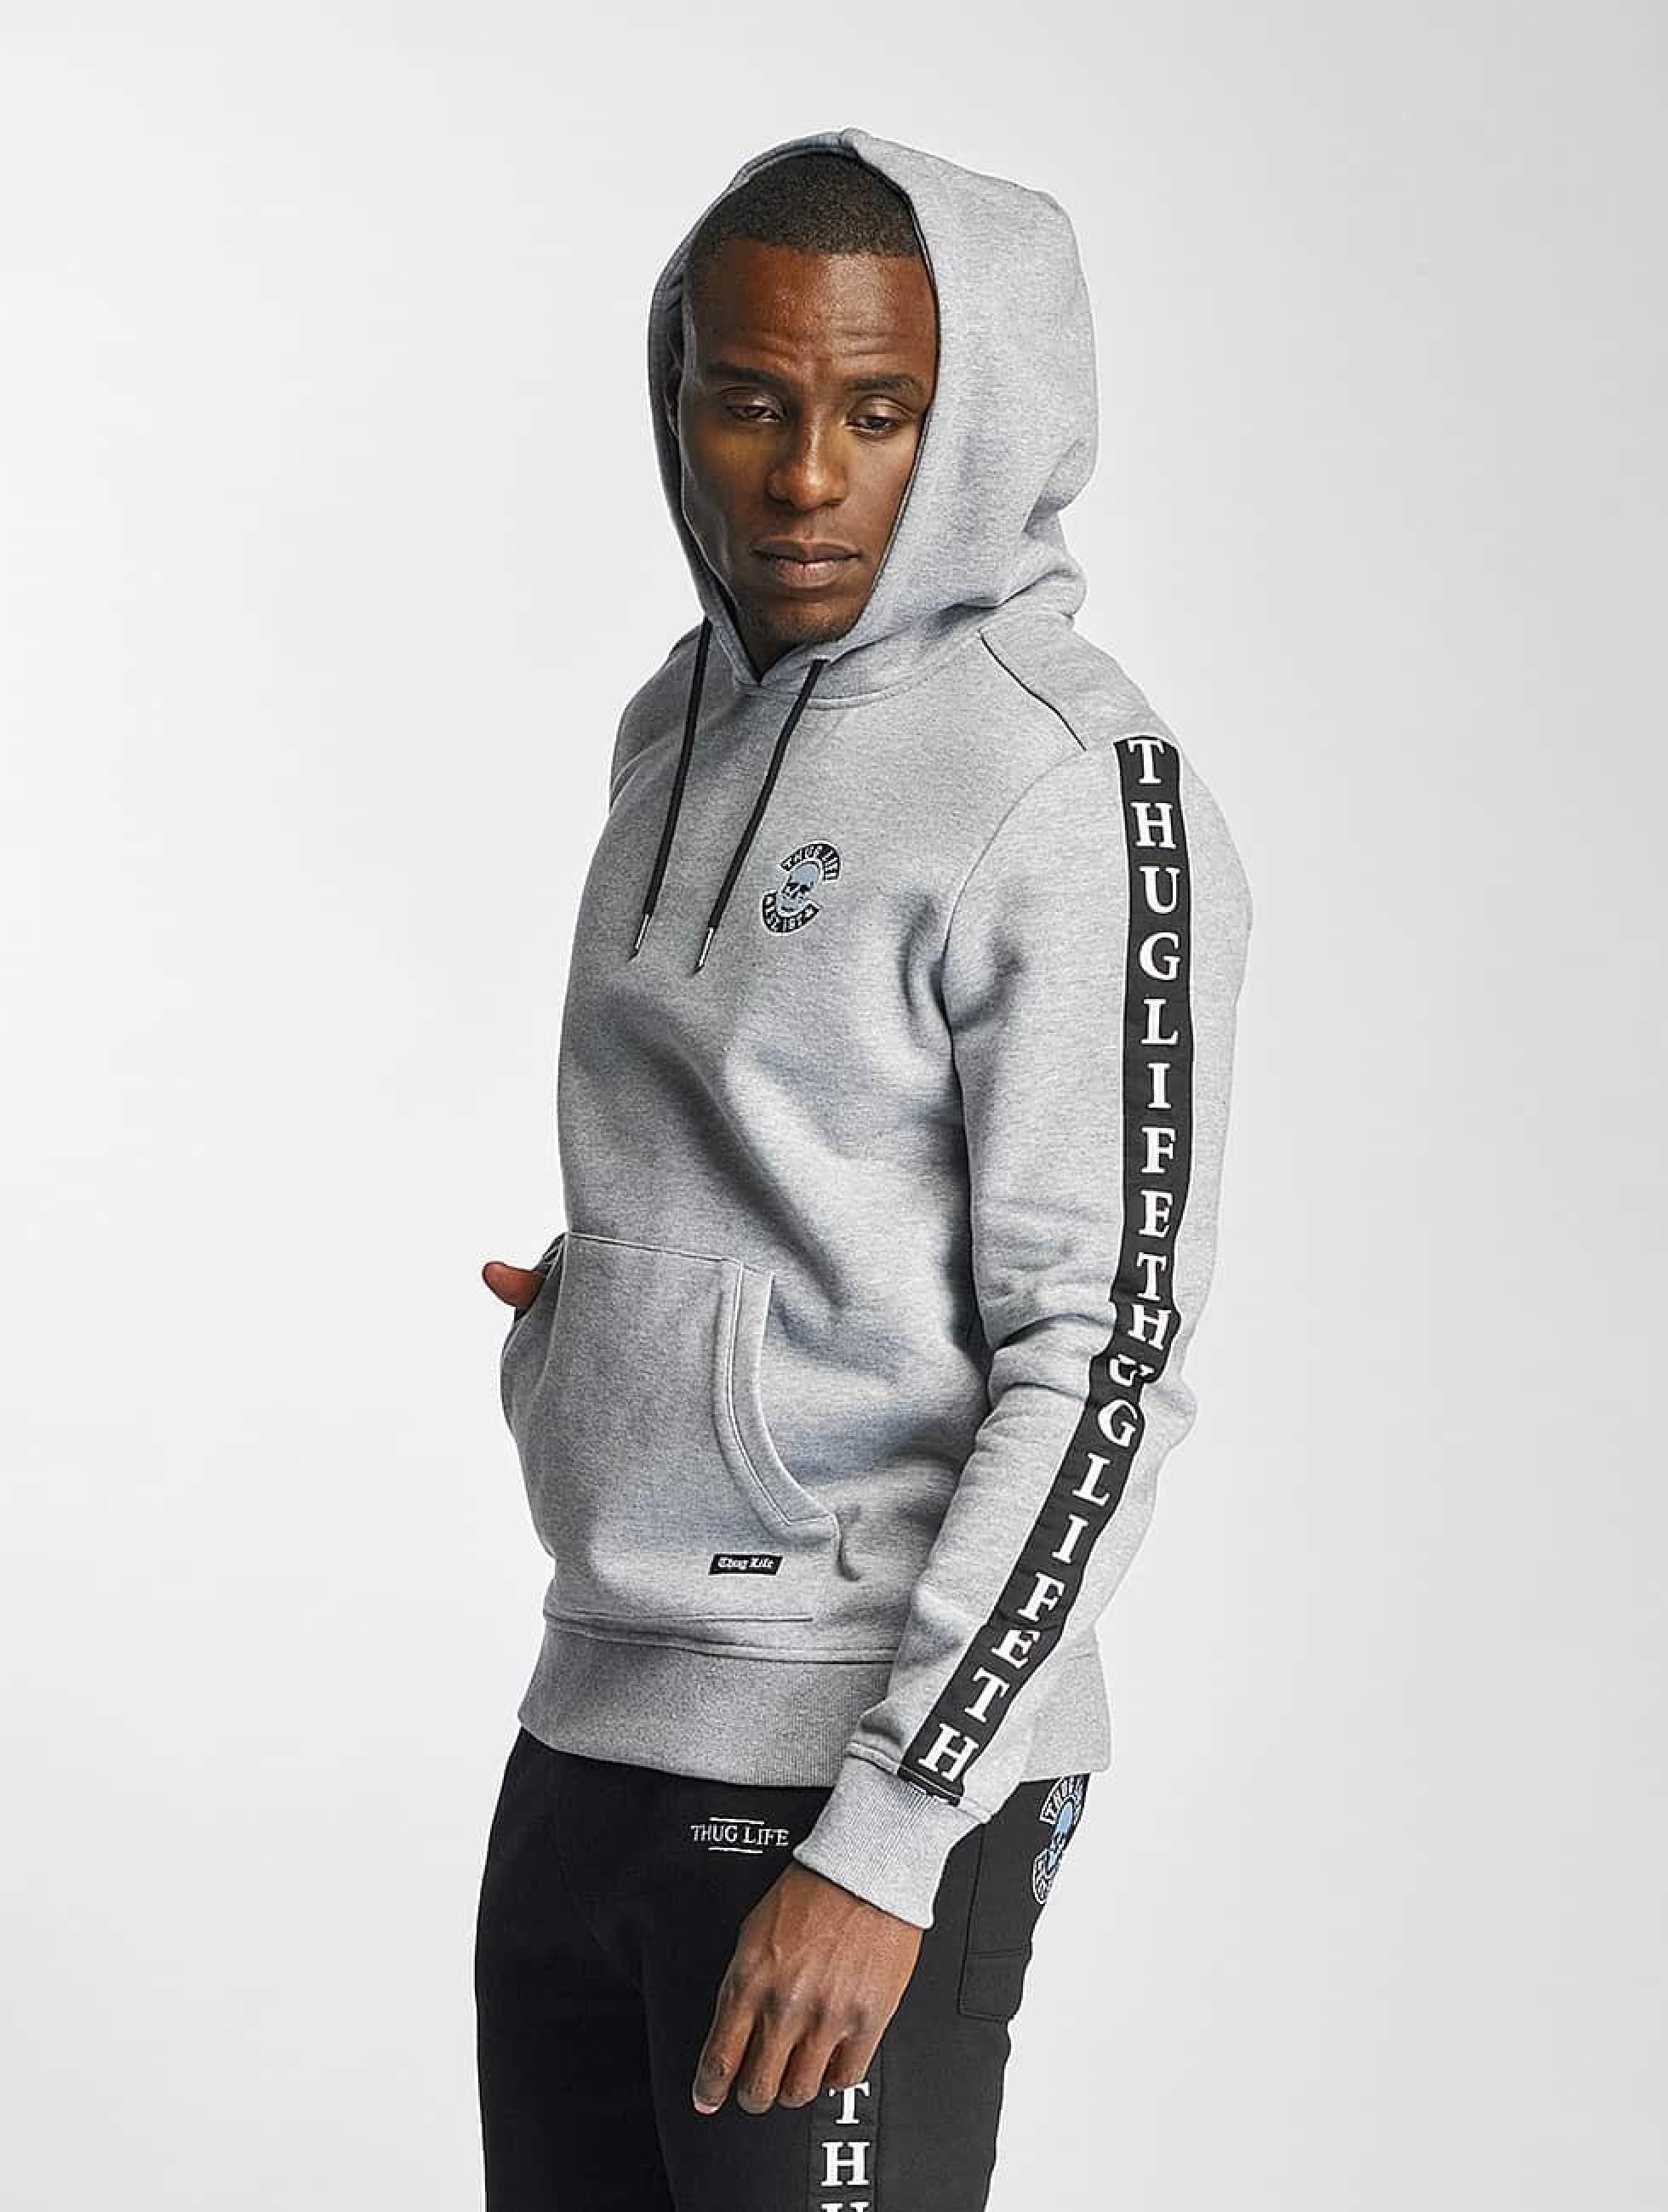 Thug Life / Hoodie Based in grey 3XL